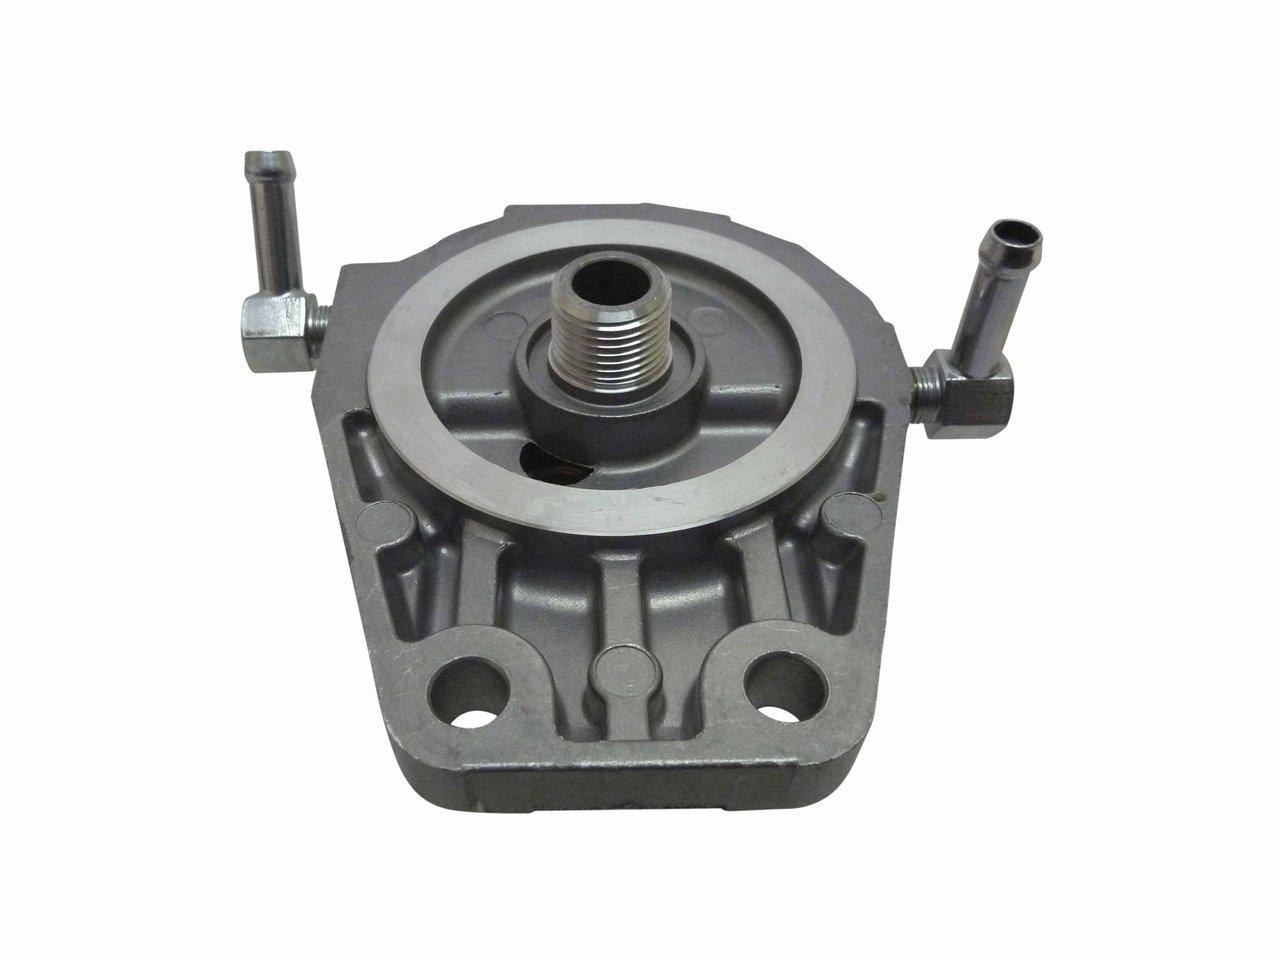 hight resolution of  fuel lift primer pump suitable for nissan patrol gu y61 td42 rd28 genuine 16401 vb20a